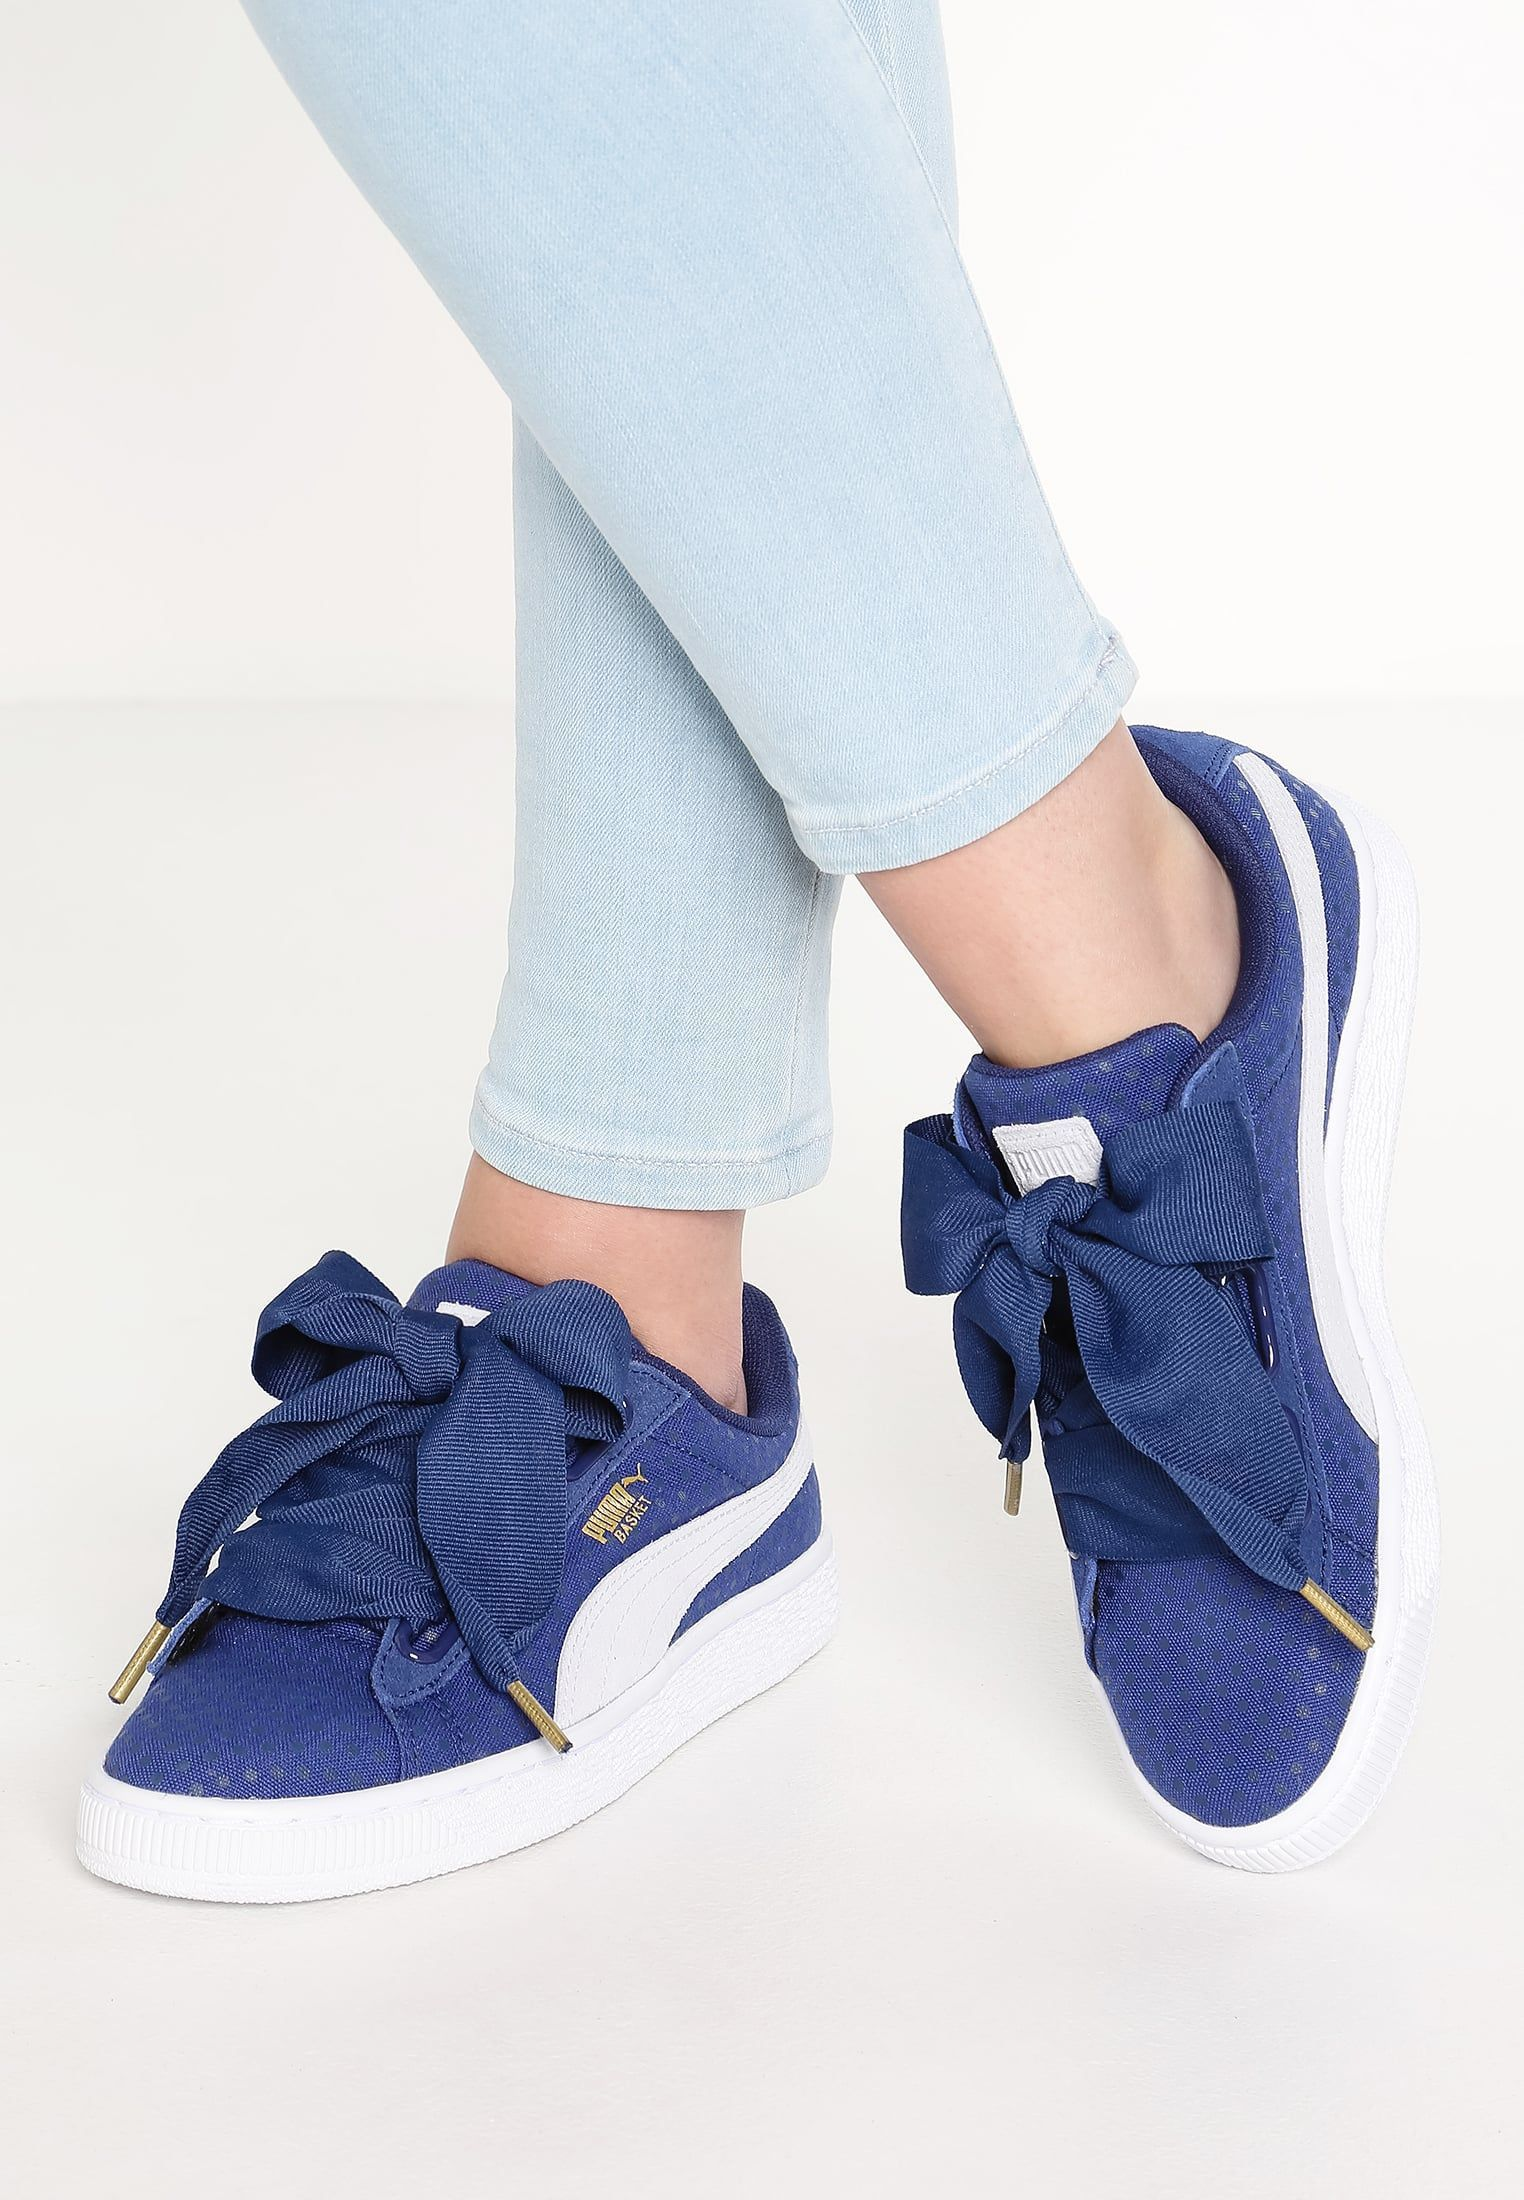 finest selection 5be5b fd307 Puma BASKET HEART - Sneakers laag - twilight blue/halogen ...